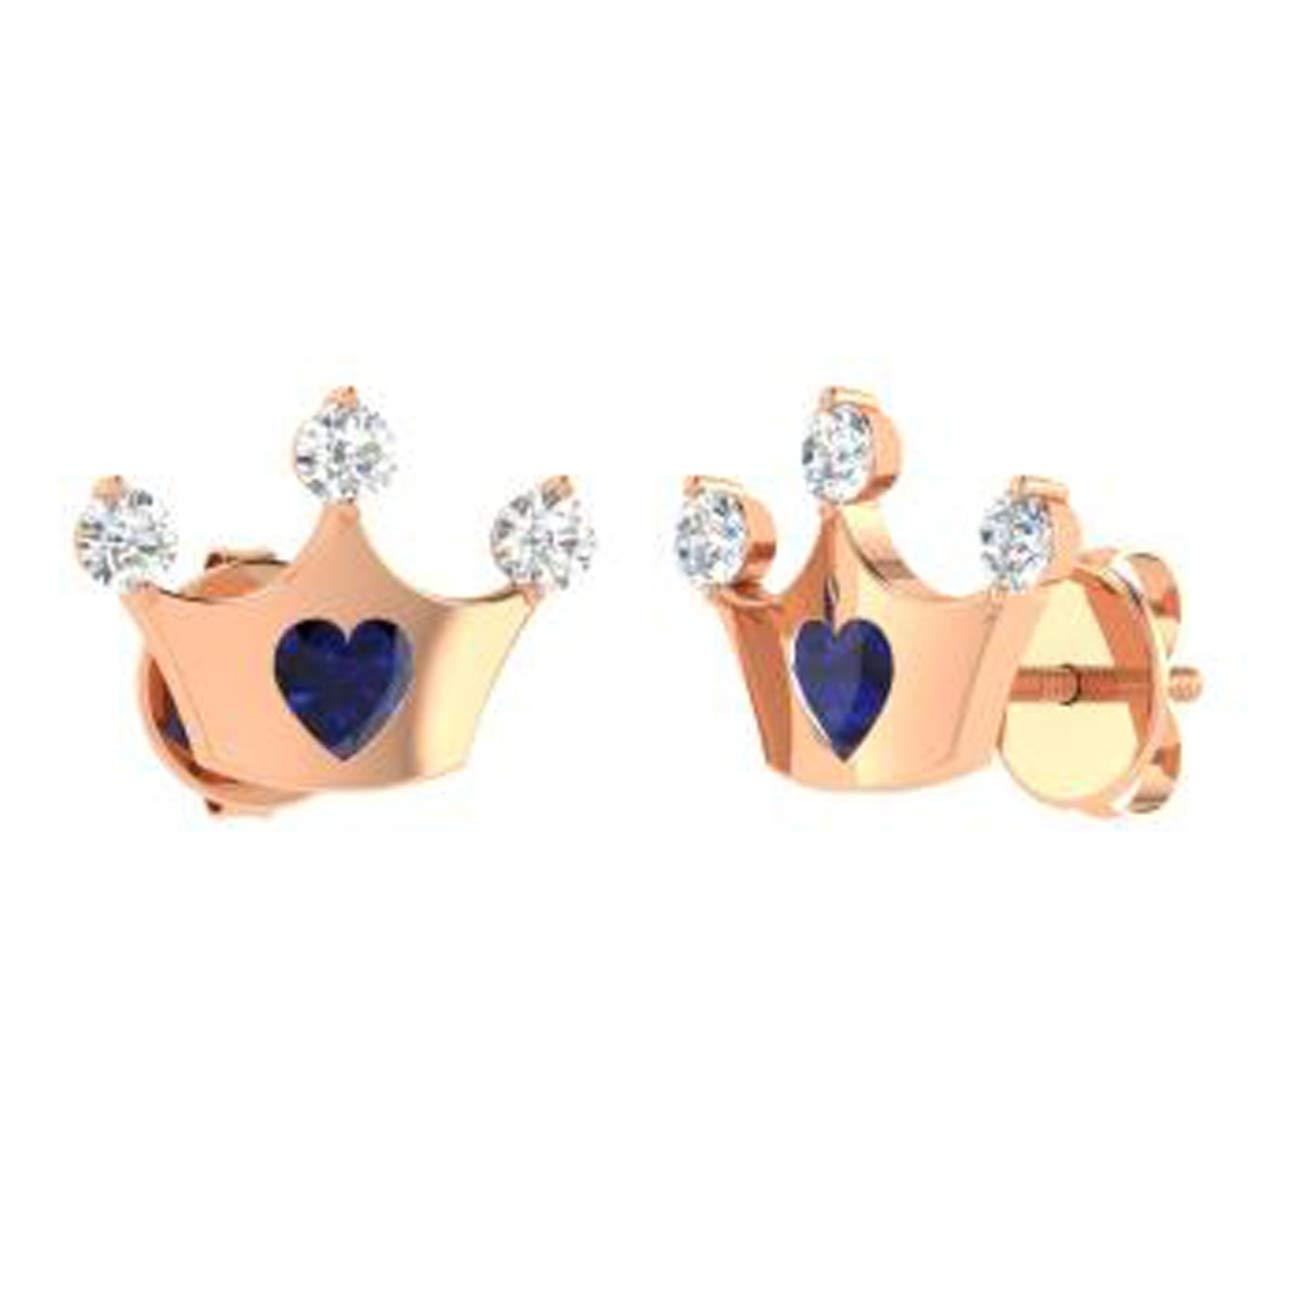 TrioStar 1.15 Ct Heart Shaped Blue Sapphire 14k Rose Gold Plated Fashinable Princess Crown Shape Stud Earrings